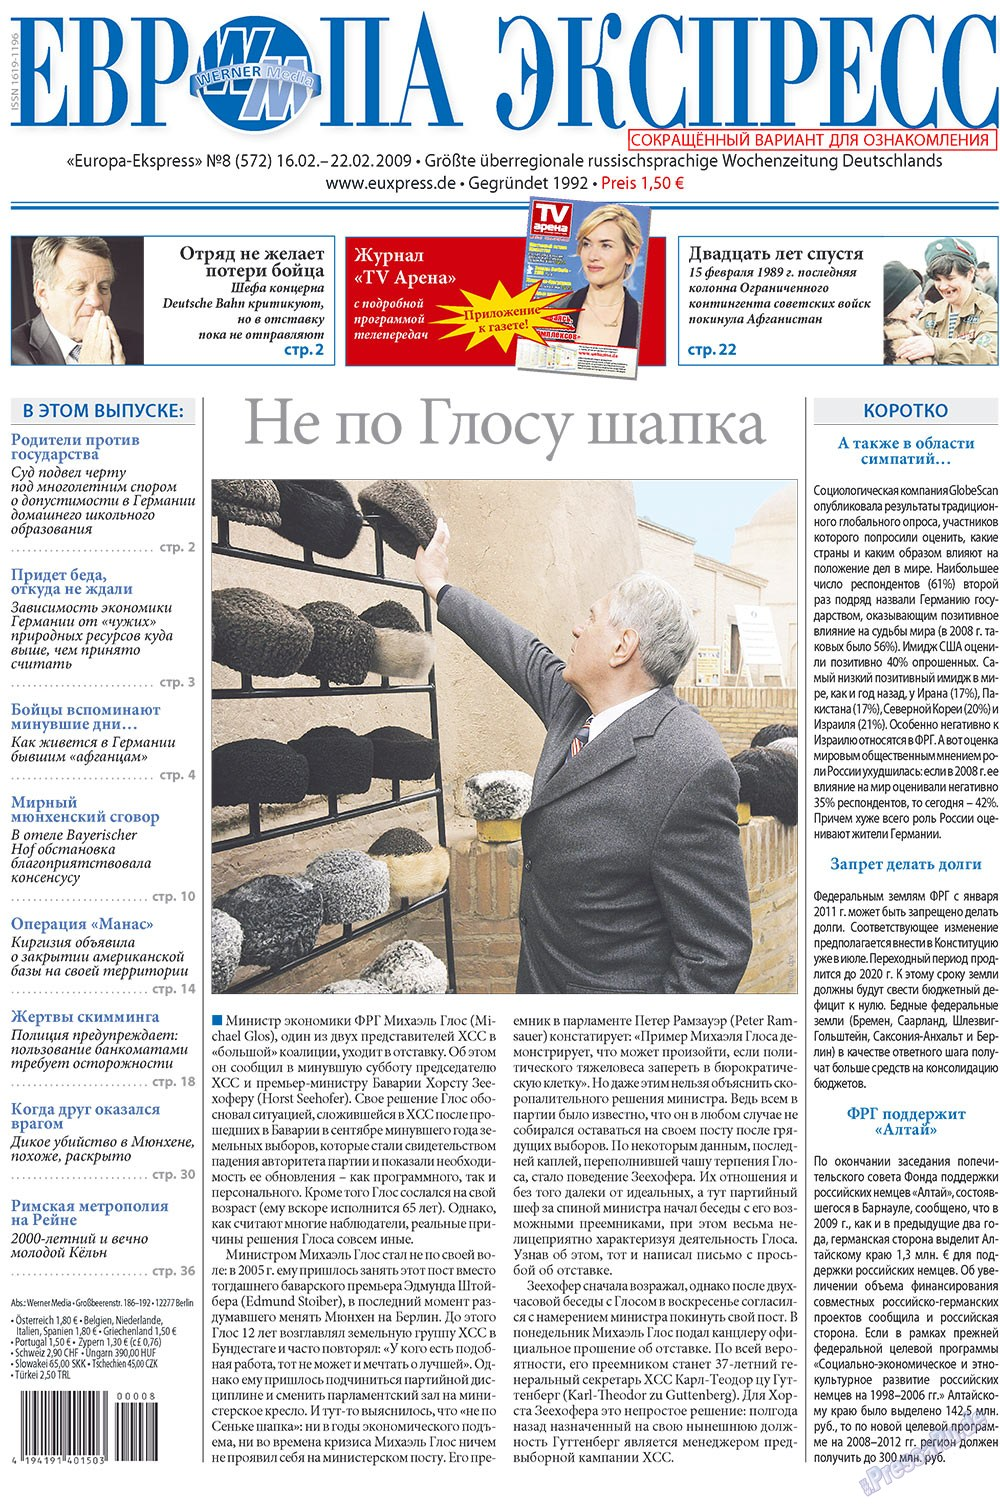 Европа экспресс (газета). 2009 год, номер 8, стр. 1